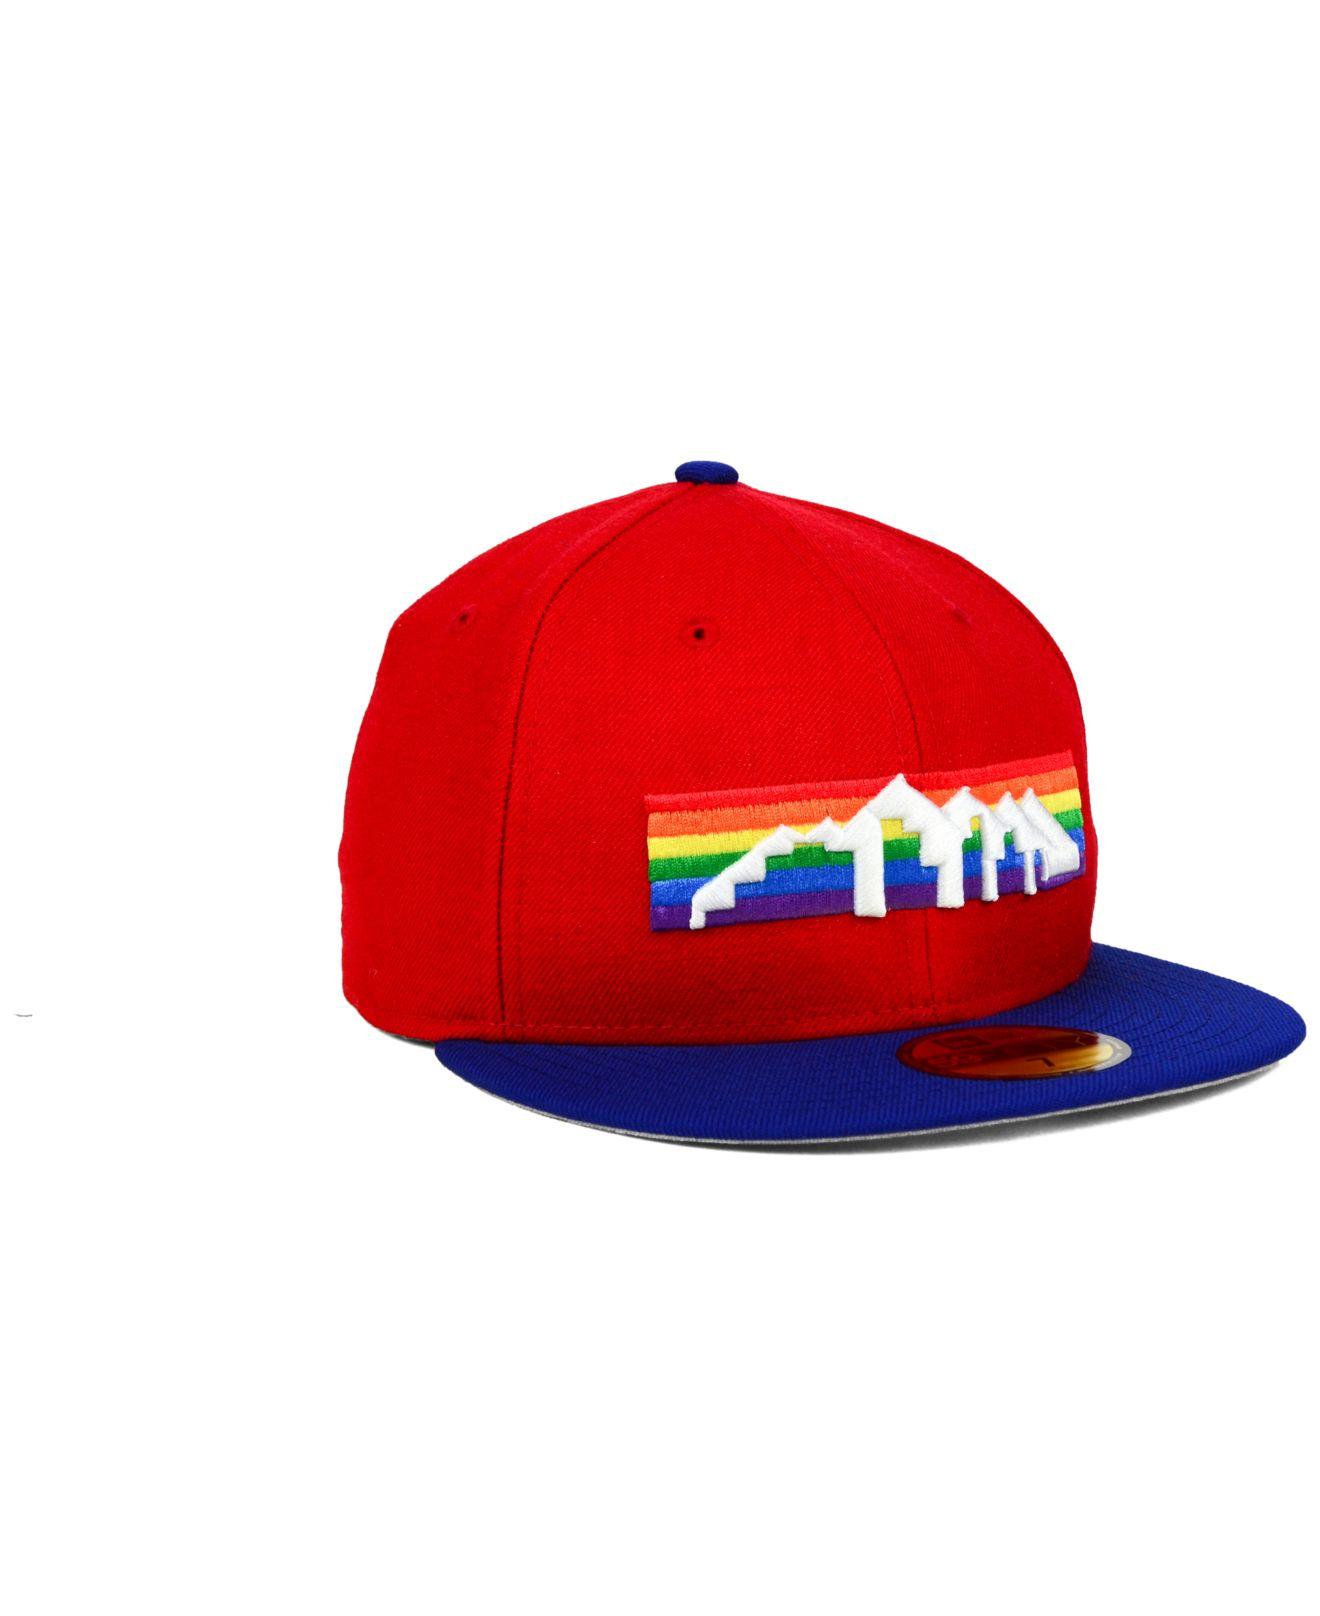 Denver Nuggets Basketball Colors: Ktz Denver Nuggets Hwc Team Color 59fifty Cap In